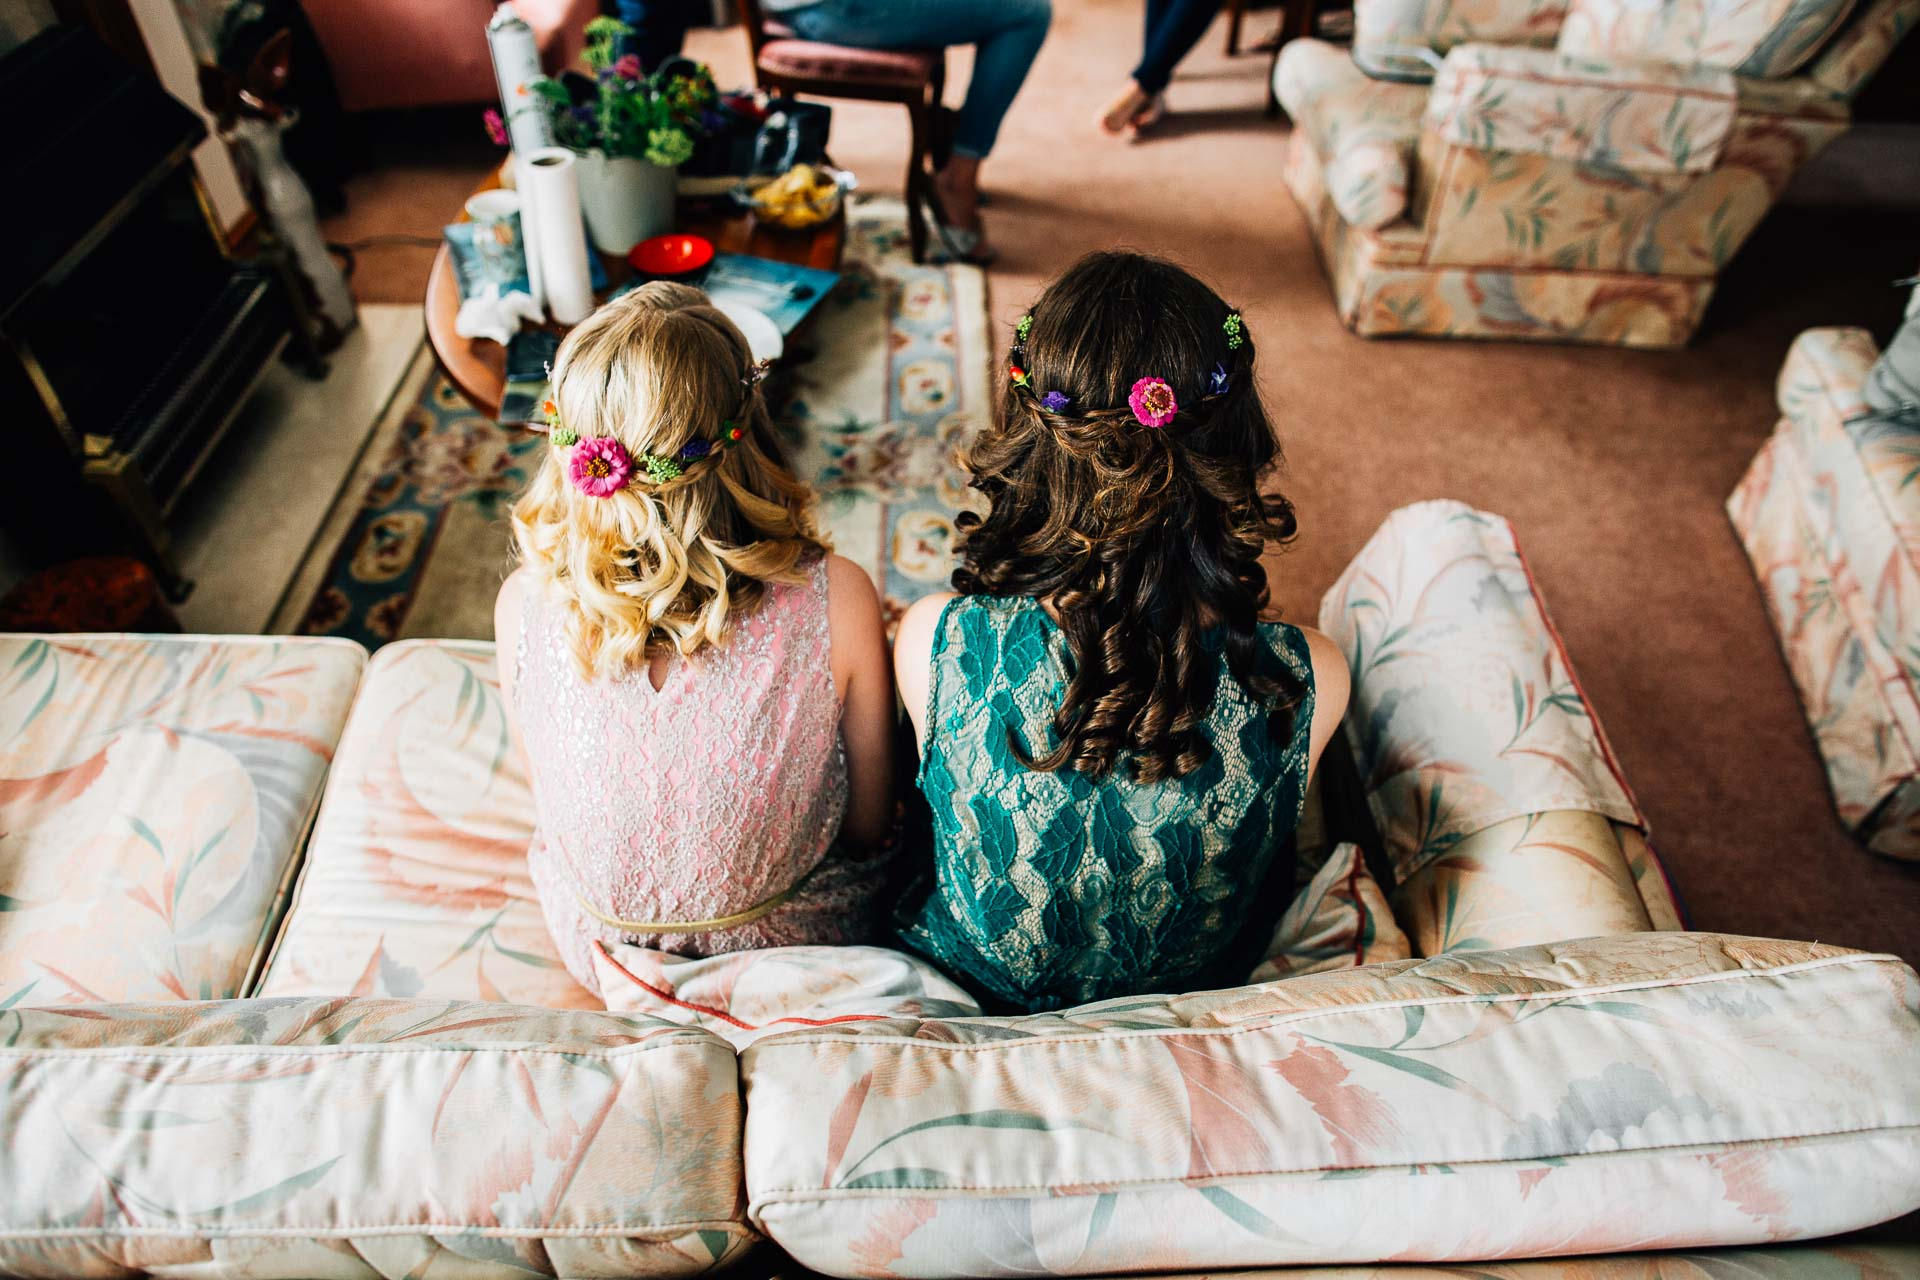 winterbourne-medieval-barn-wedding-photography-emma-andrew-3